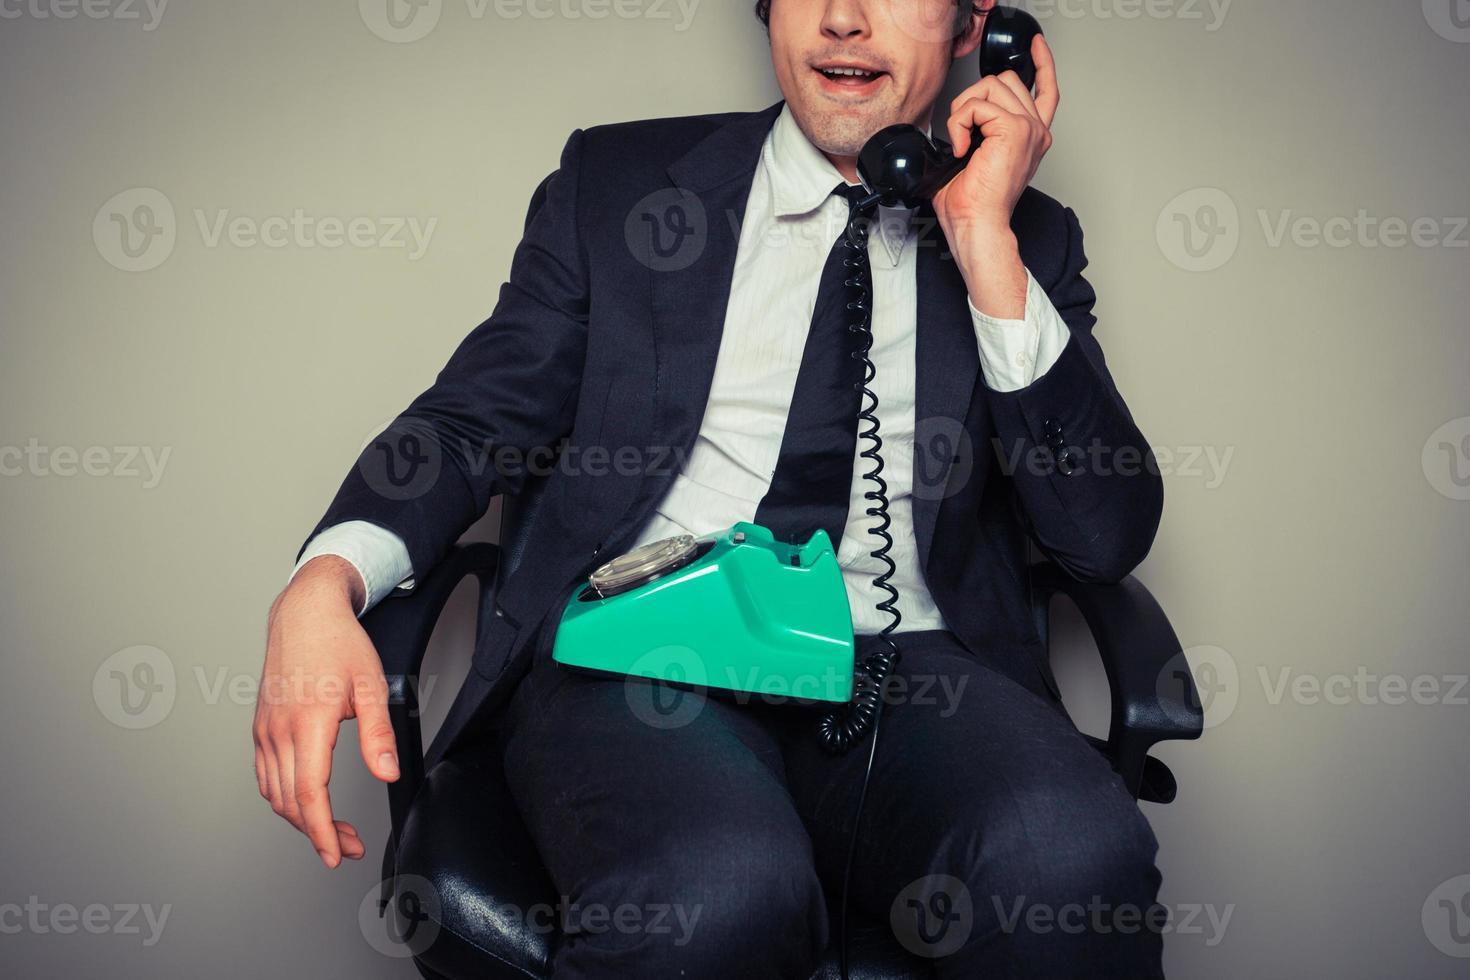 empresario molesto por teléfono foto